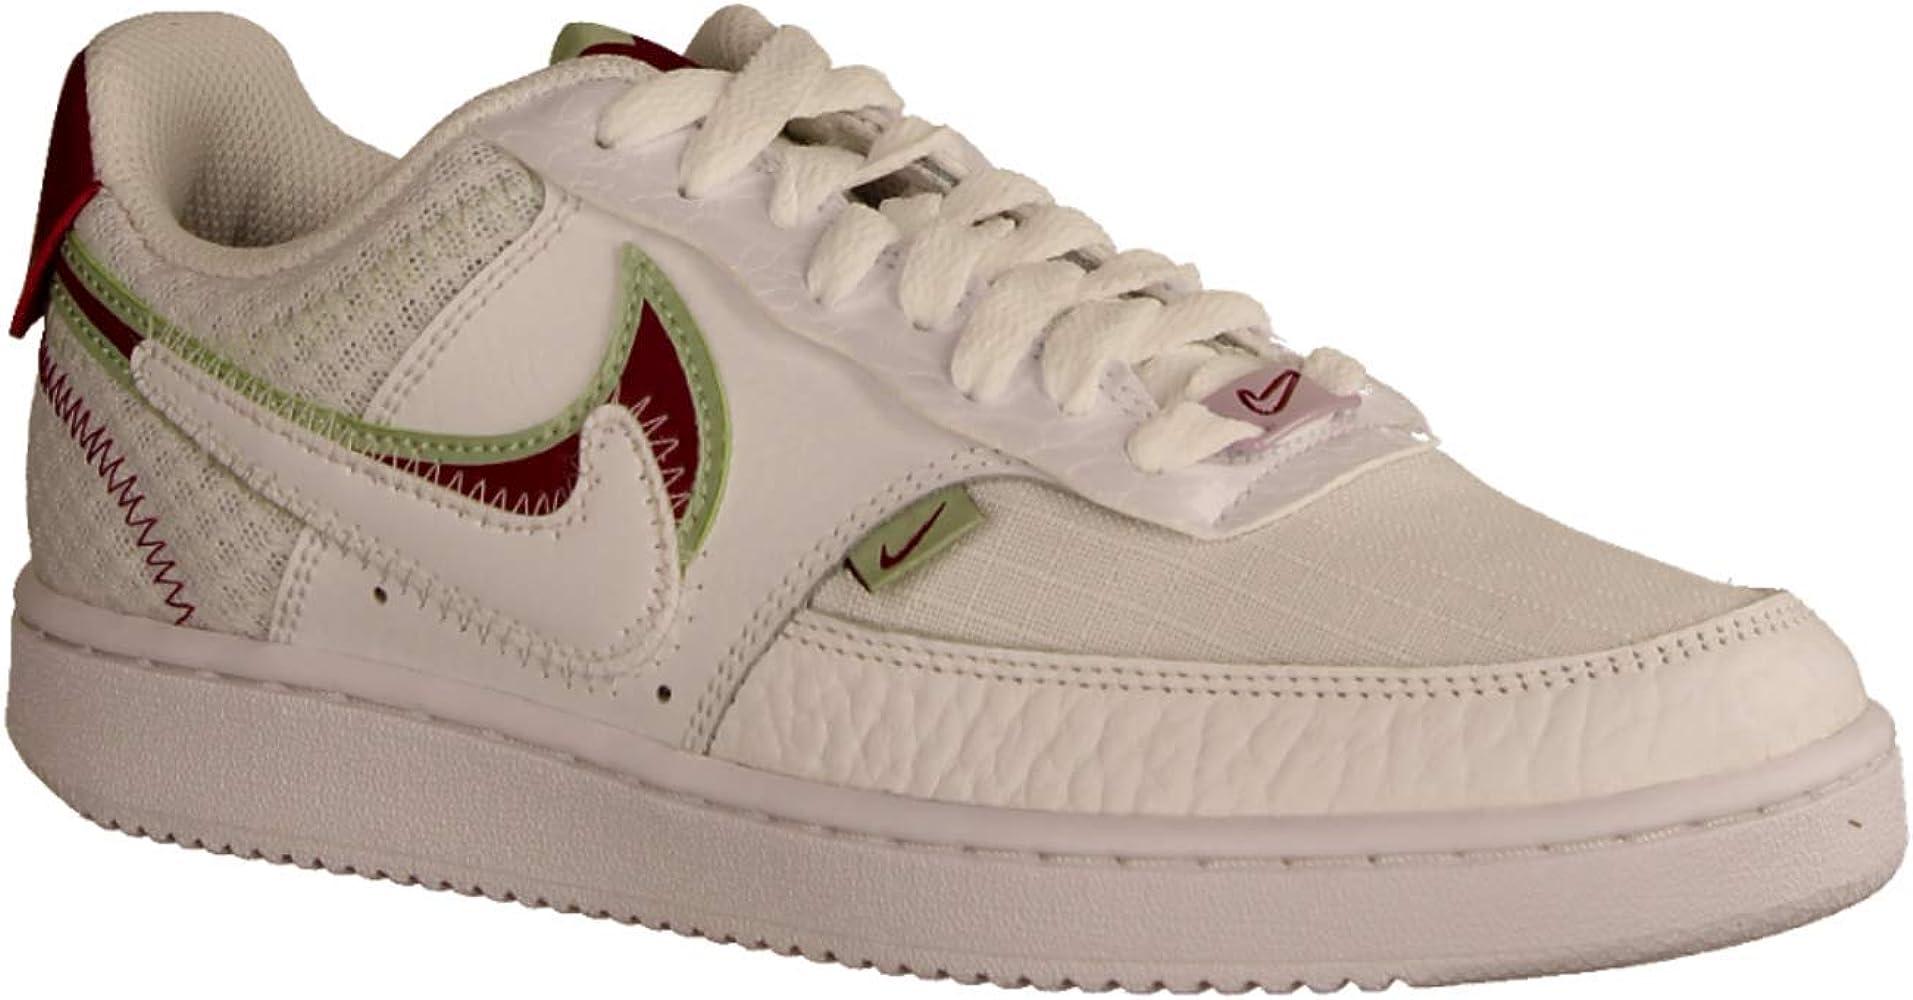 Nike Wmns Court Vision Lo Prmv, Zapatilla De Baloncesto para Mujer ...